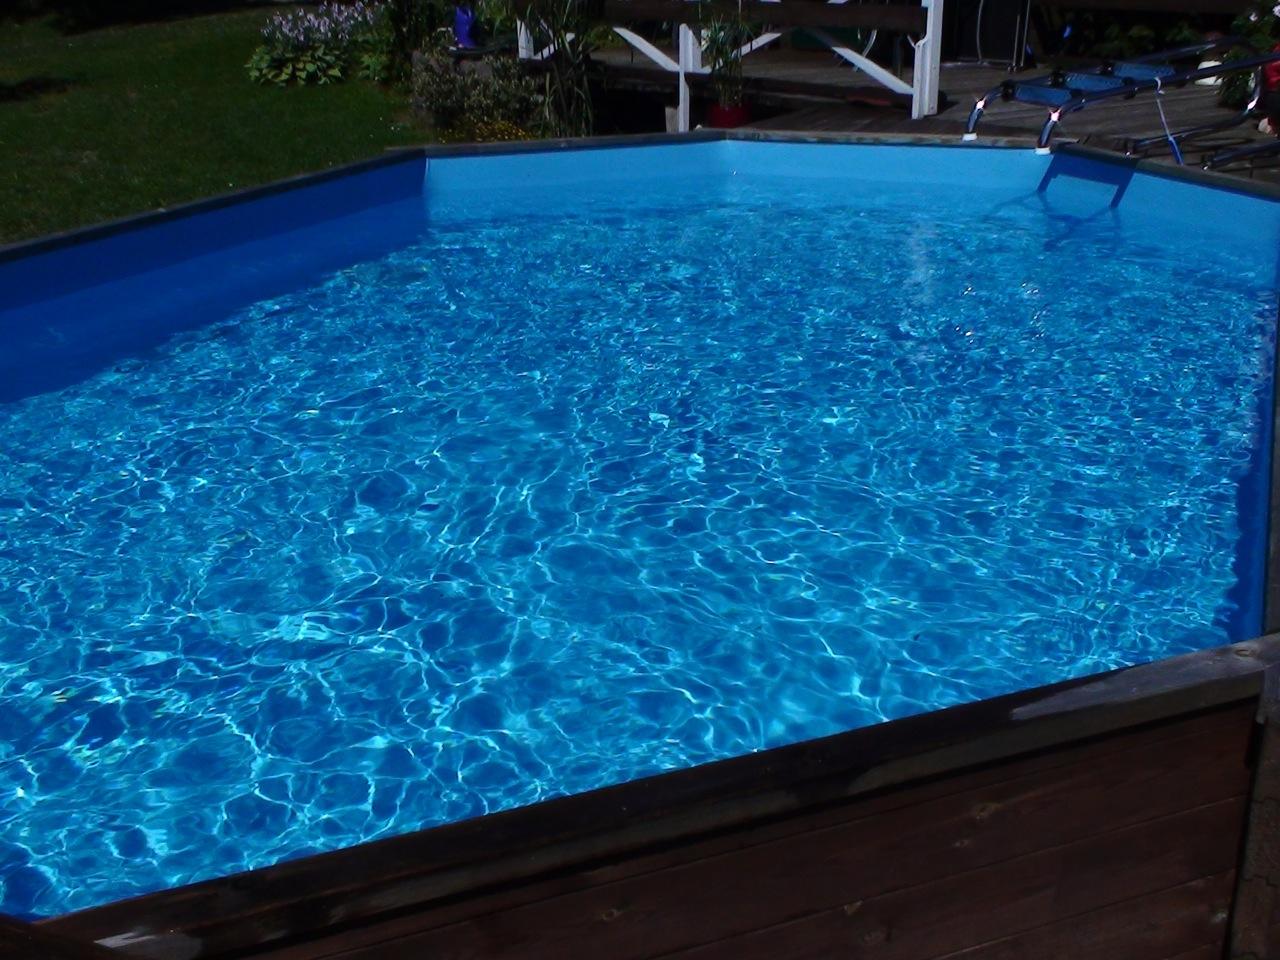 Bestway swimmingpool holzpool stahlwandbecken bis 20 for Garten pool stahlwandbecken